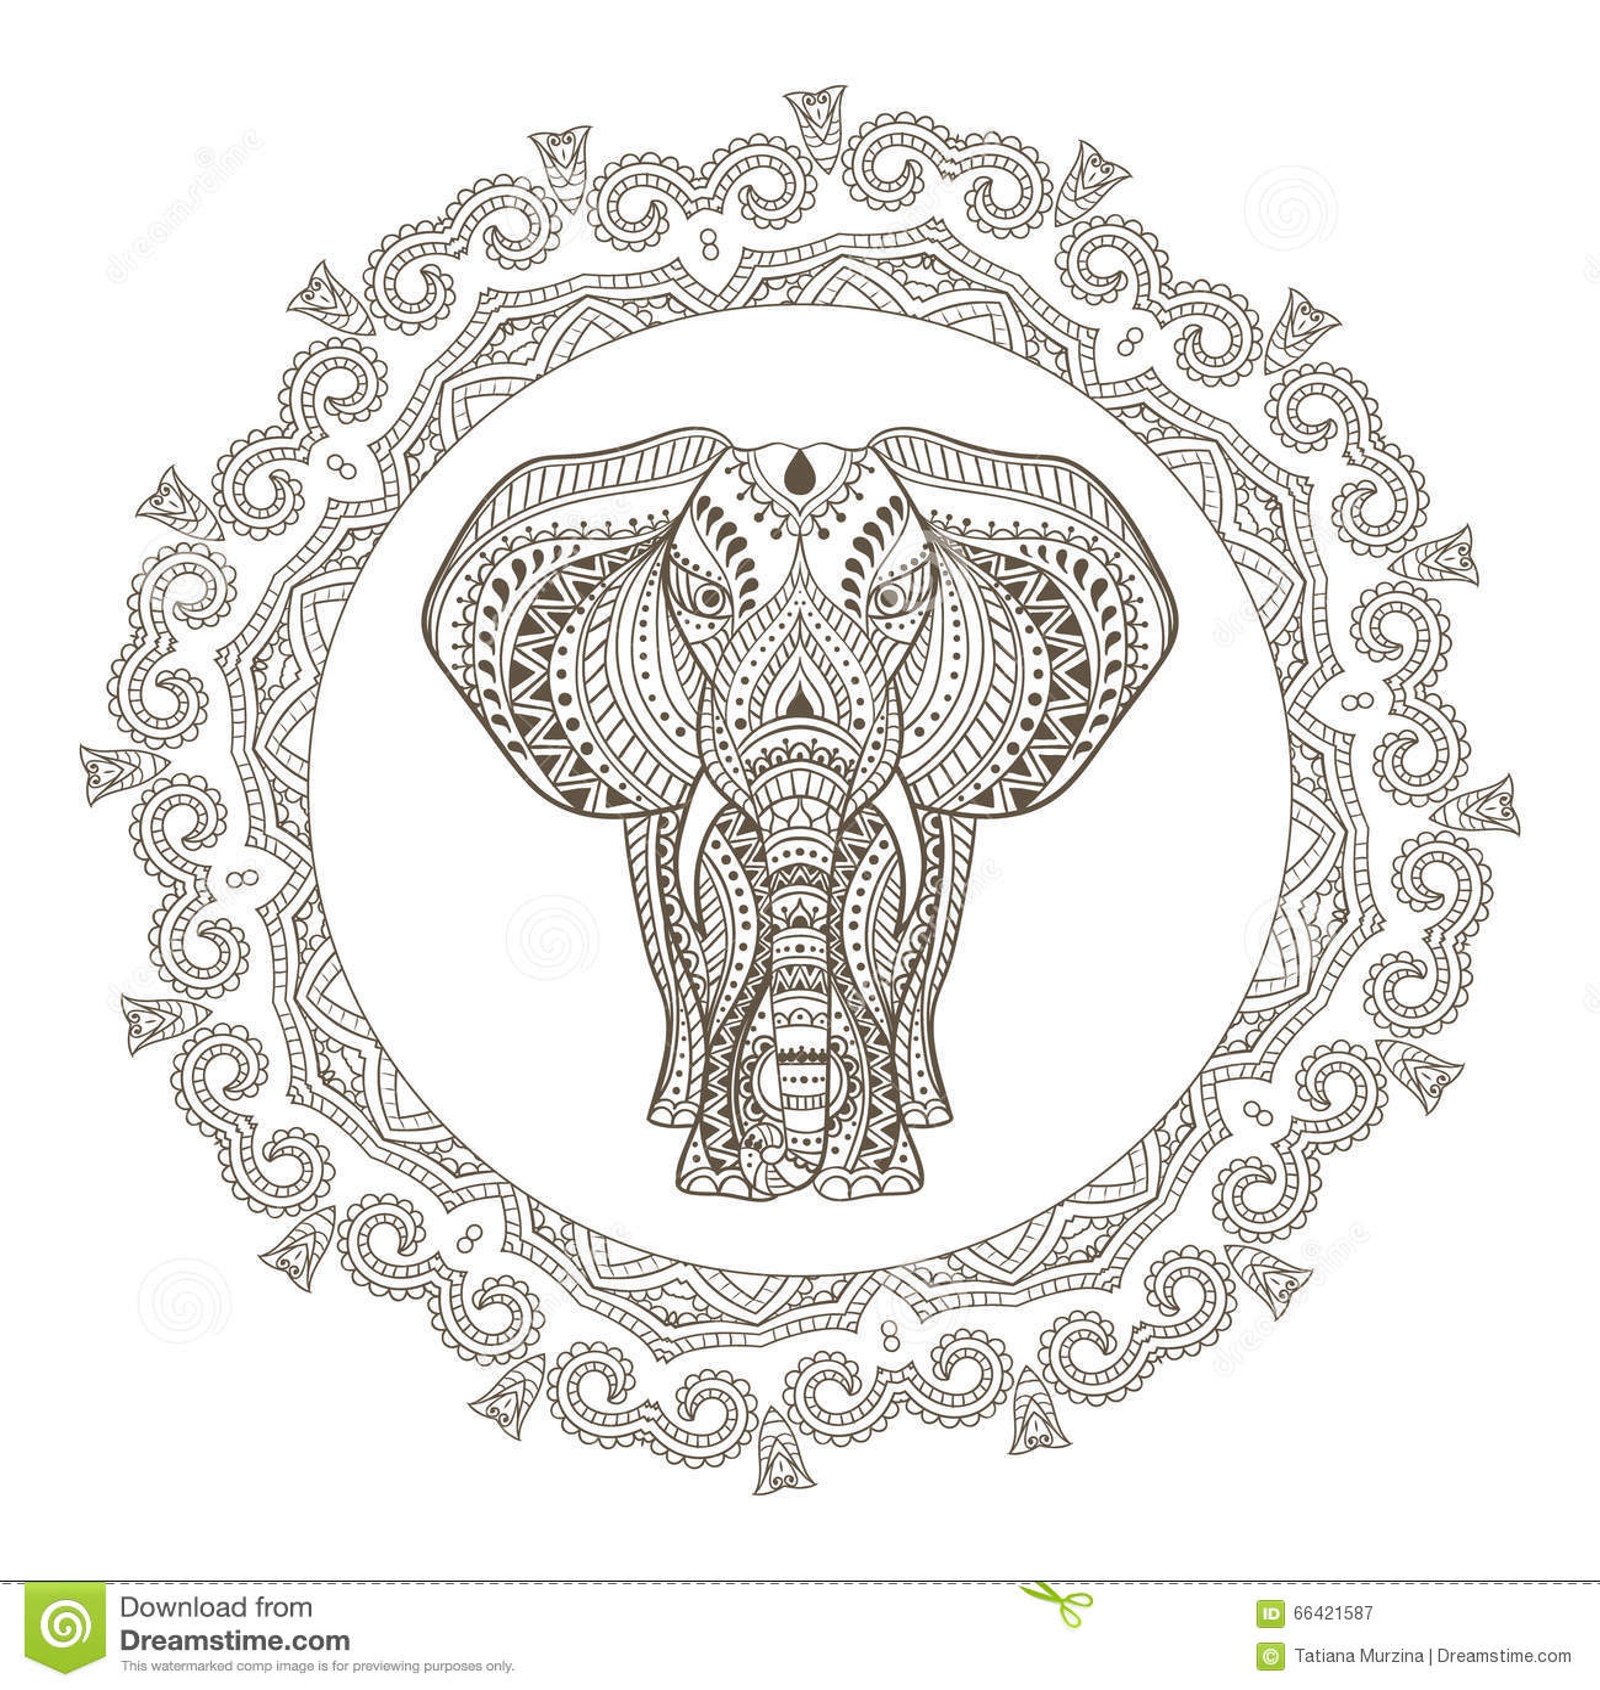 Free ornamental mandala vector download free vector art stock - Vector Ethnic Indian Elephant In Mandala Frame Stock